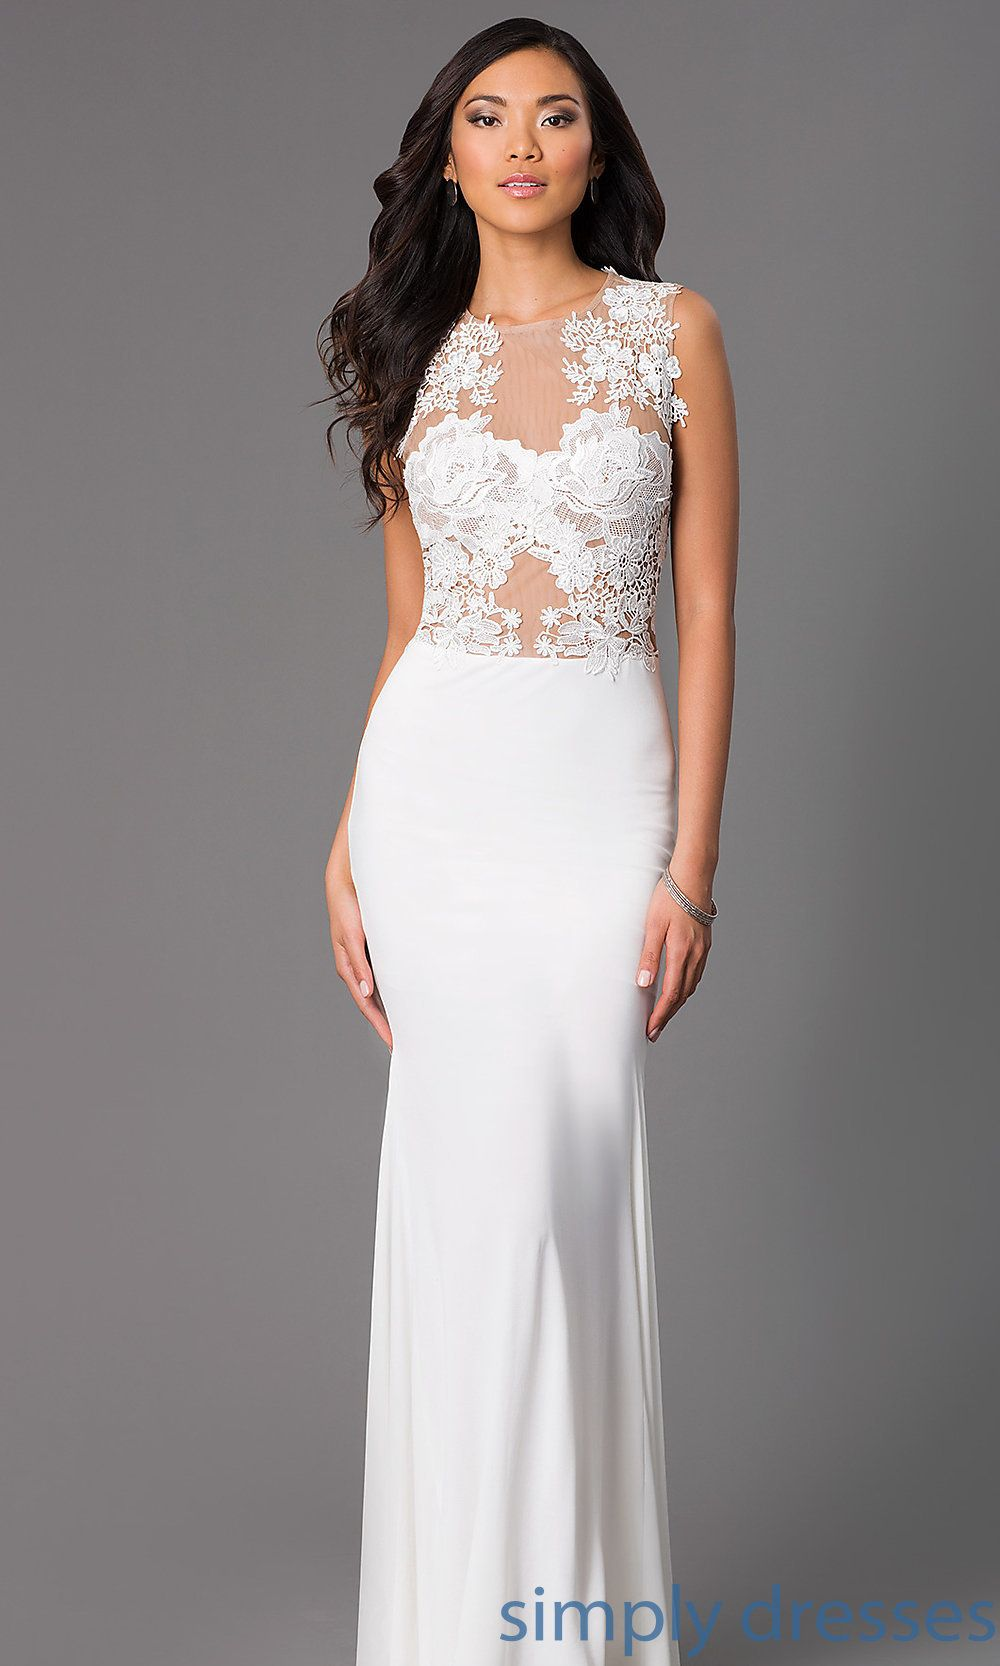 Cqdki lacebodice long formal ivory white prom dress lace